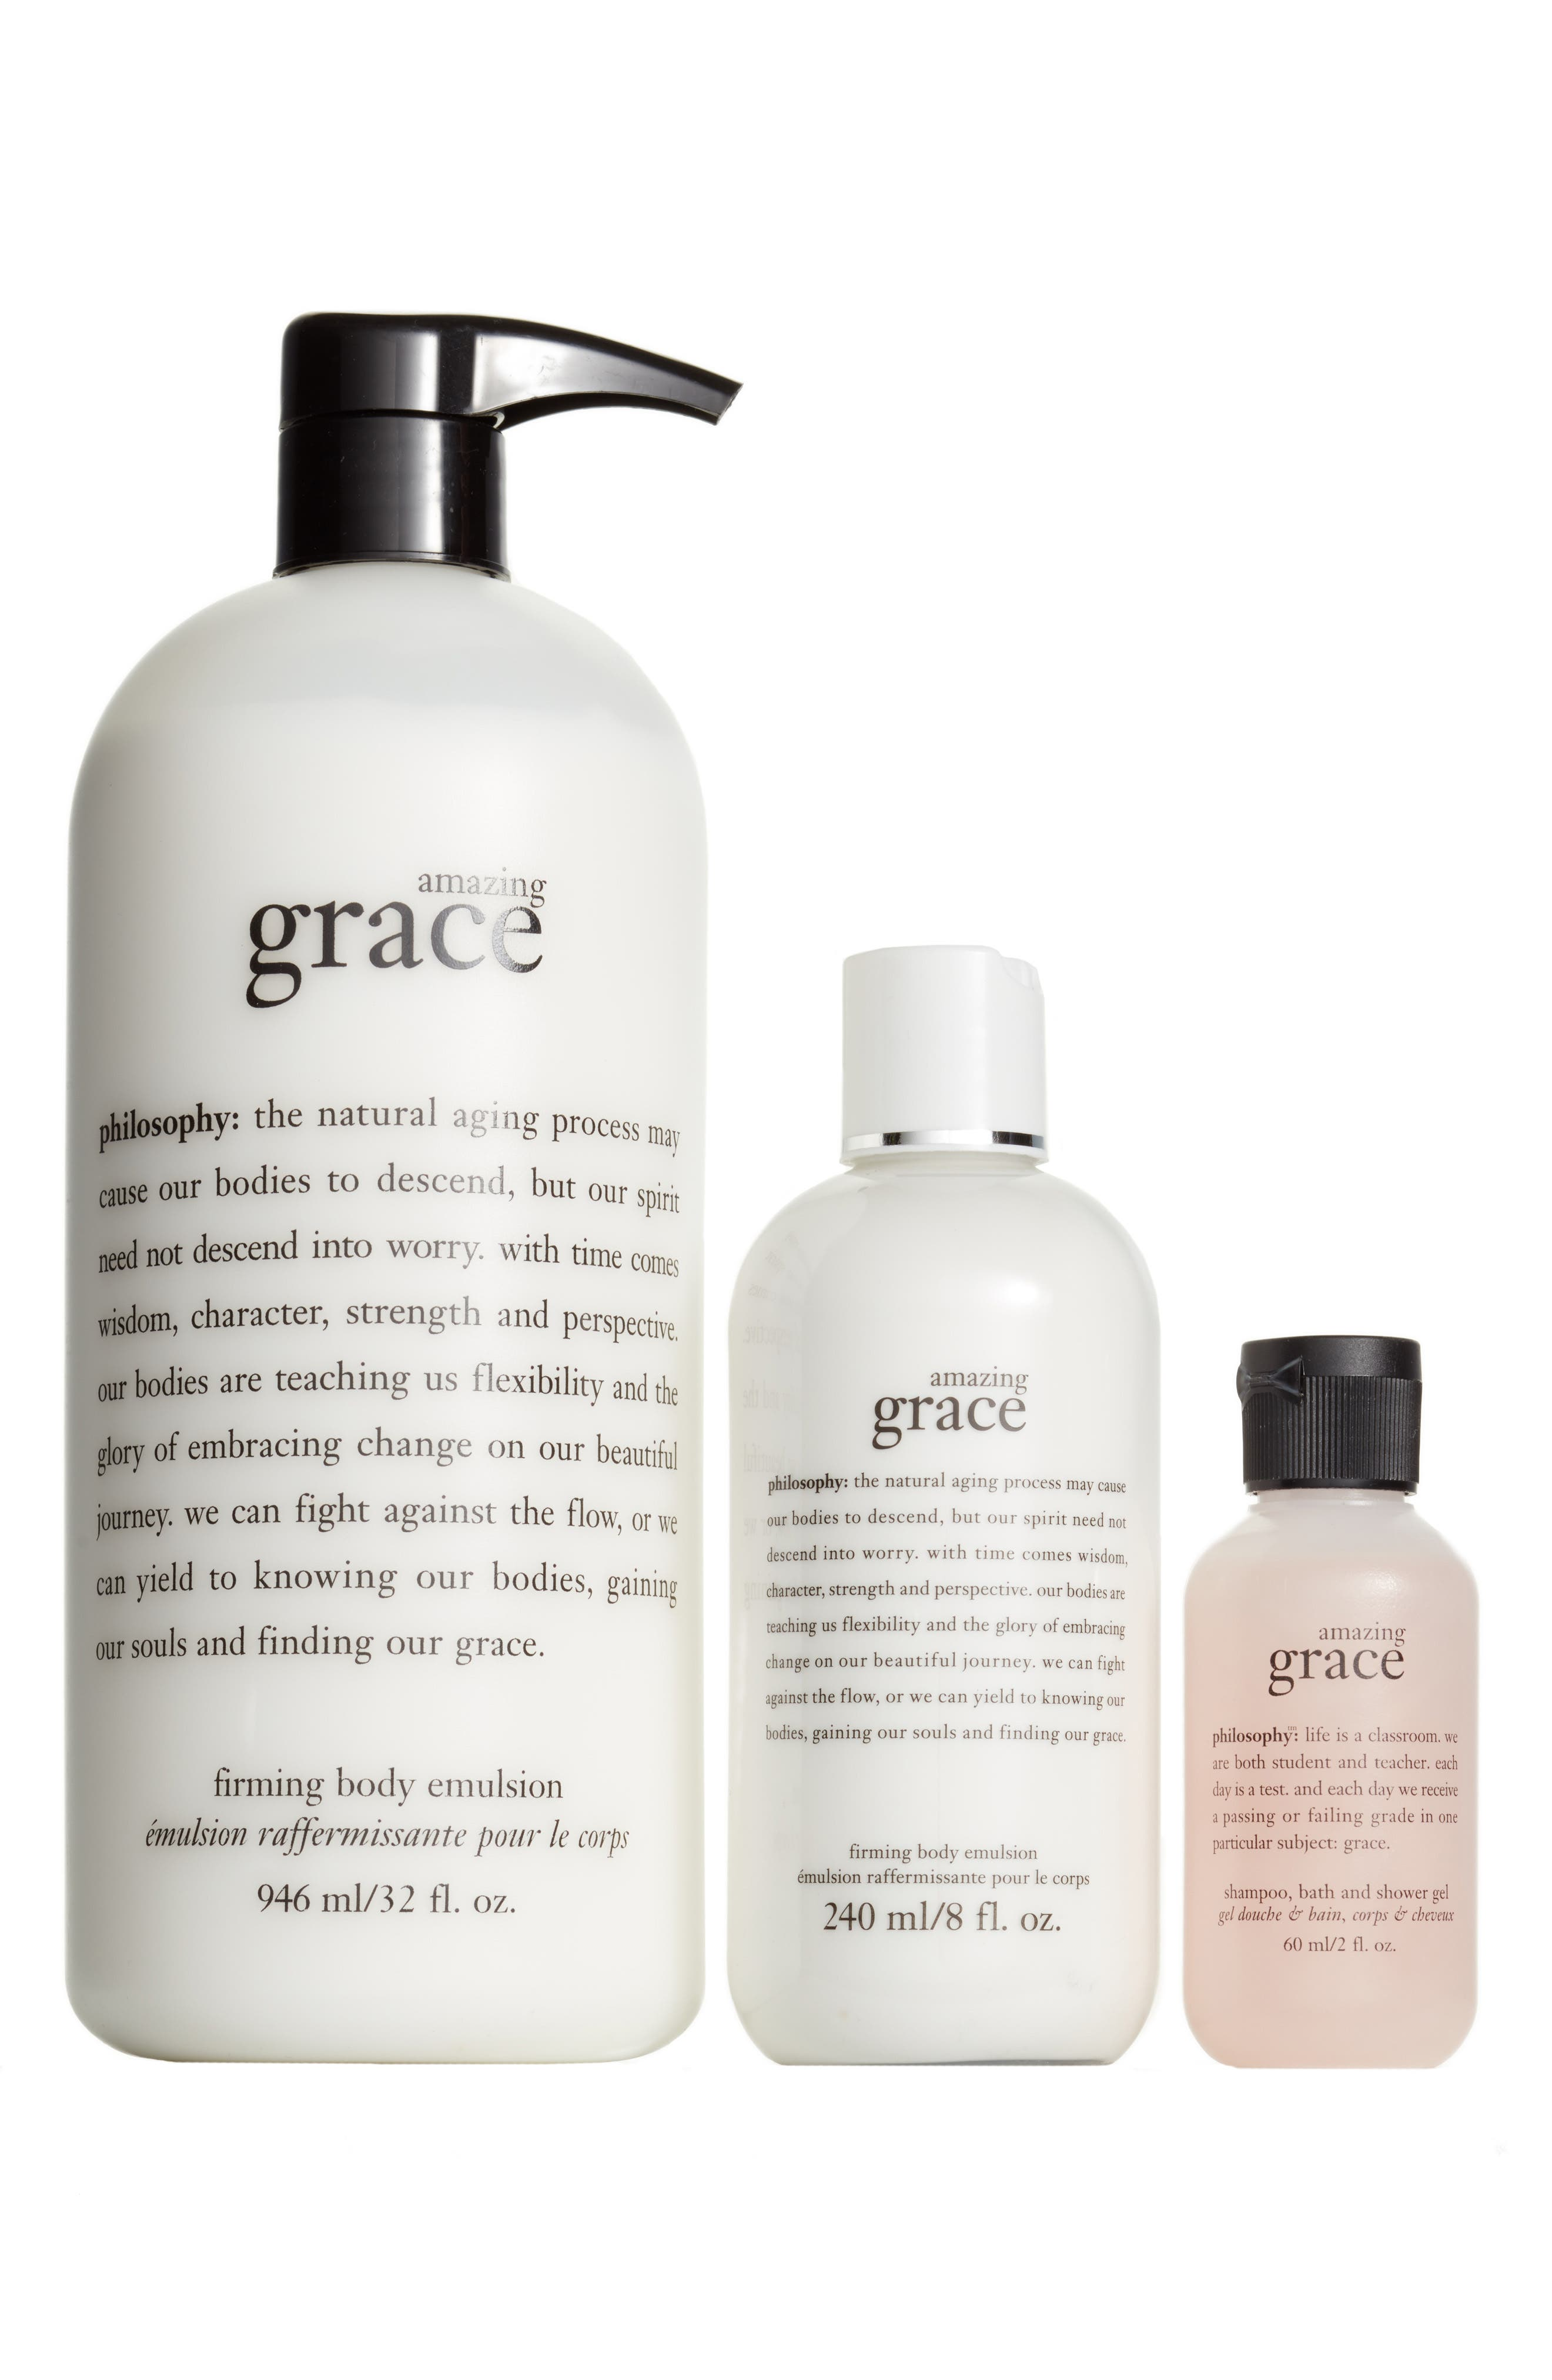 philosophy amazing grace body emulsion shower gel trio philosophy amazing grace body emulsion shower gel trio nordstrom exclusive 83 value nordstrom